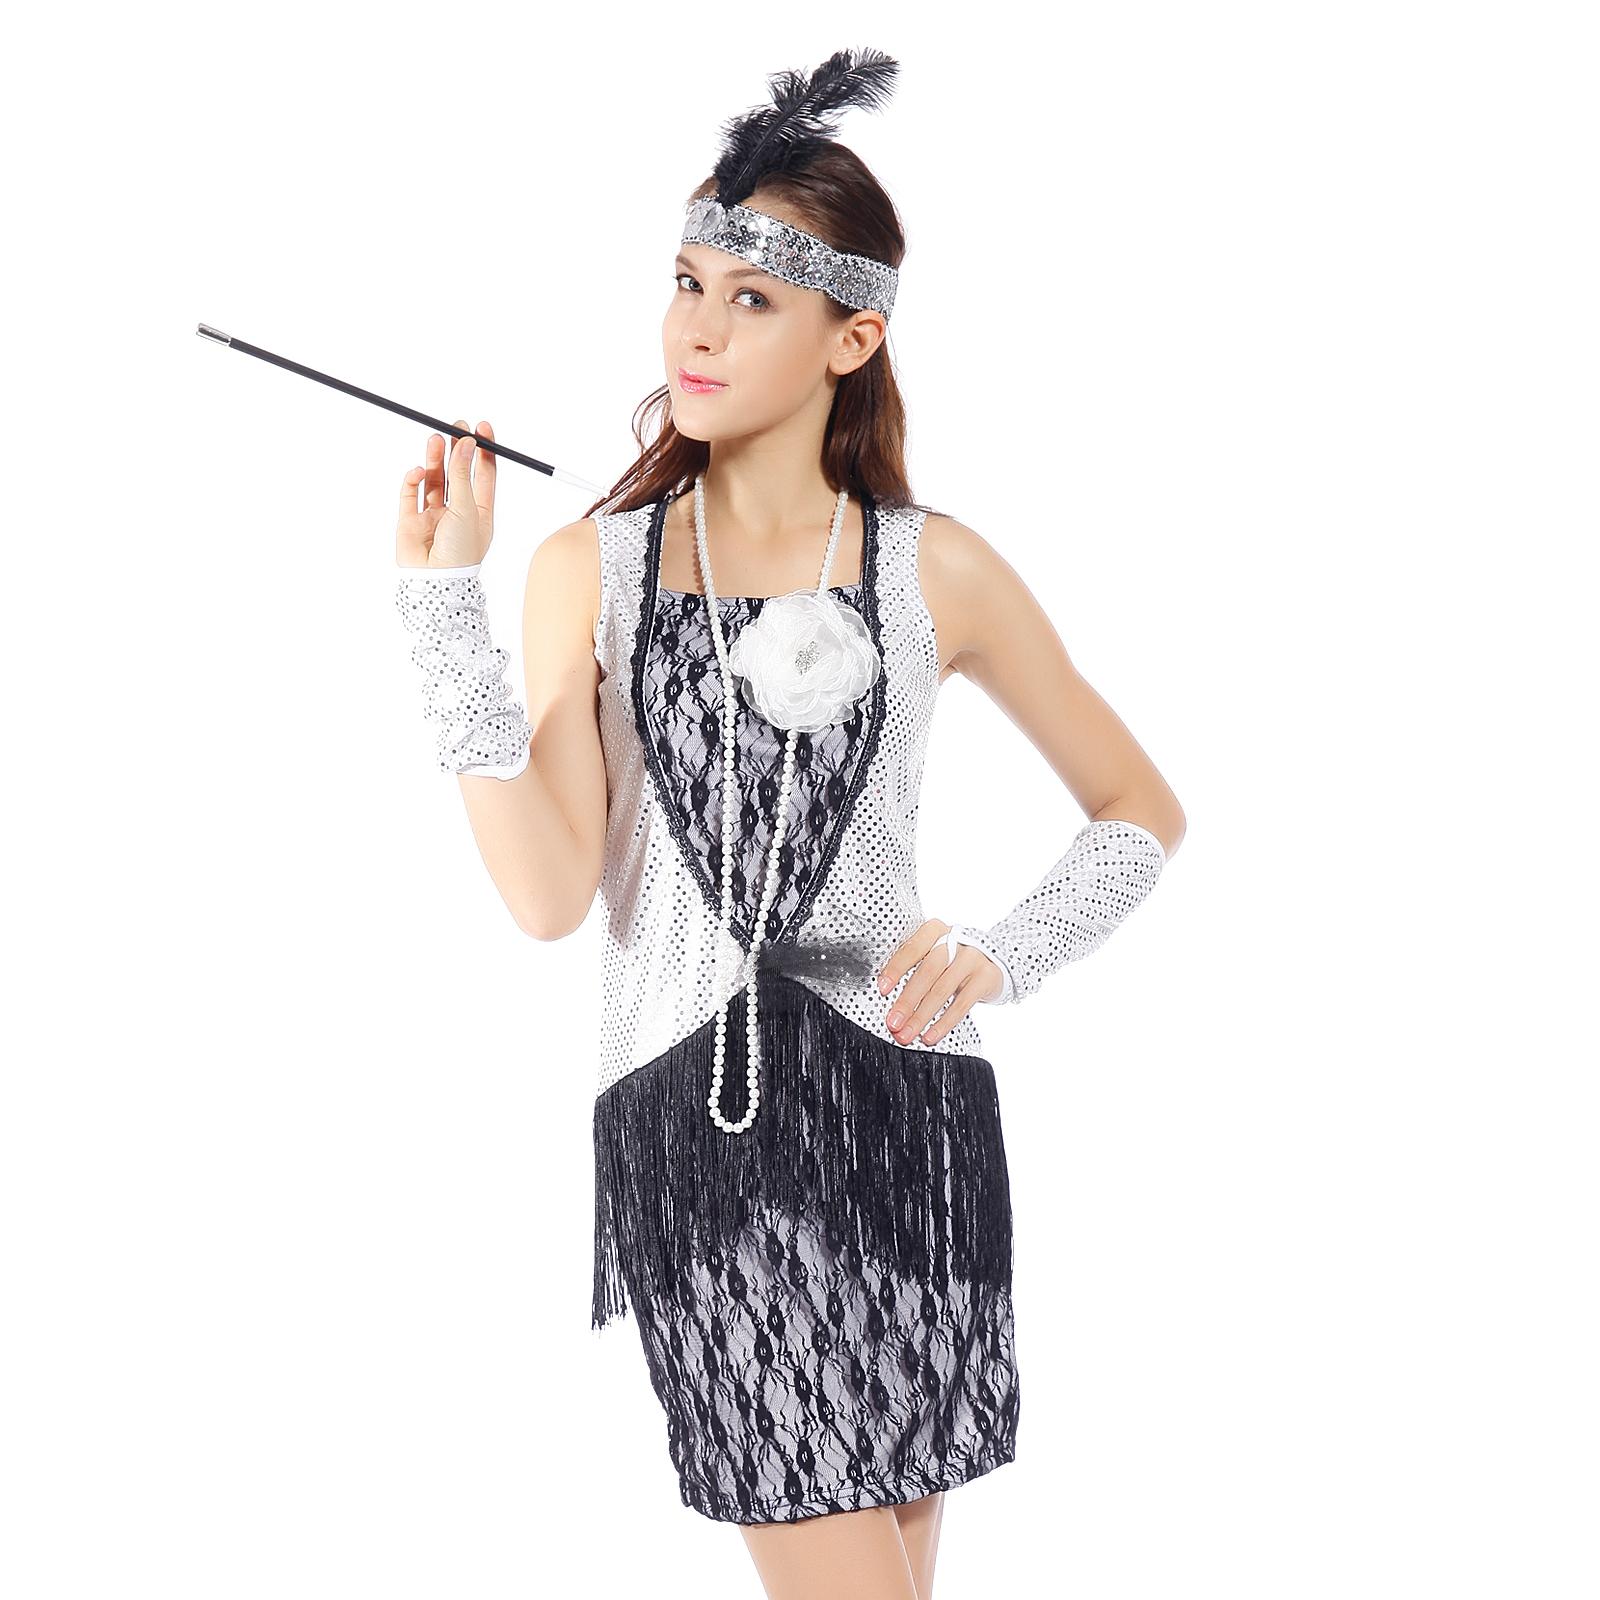 costume de deguisement robe a frange sequin 1920s 30s charleston gatsby carnaval ebay. Black Bedroom Furniture Sets. Home Design Ideas